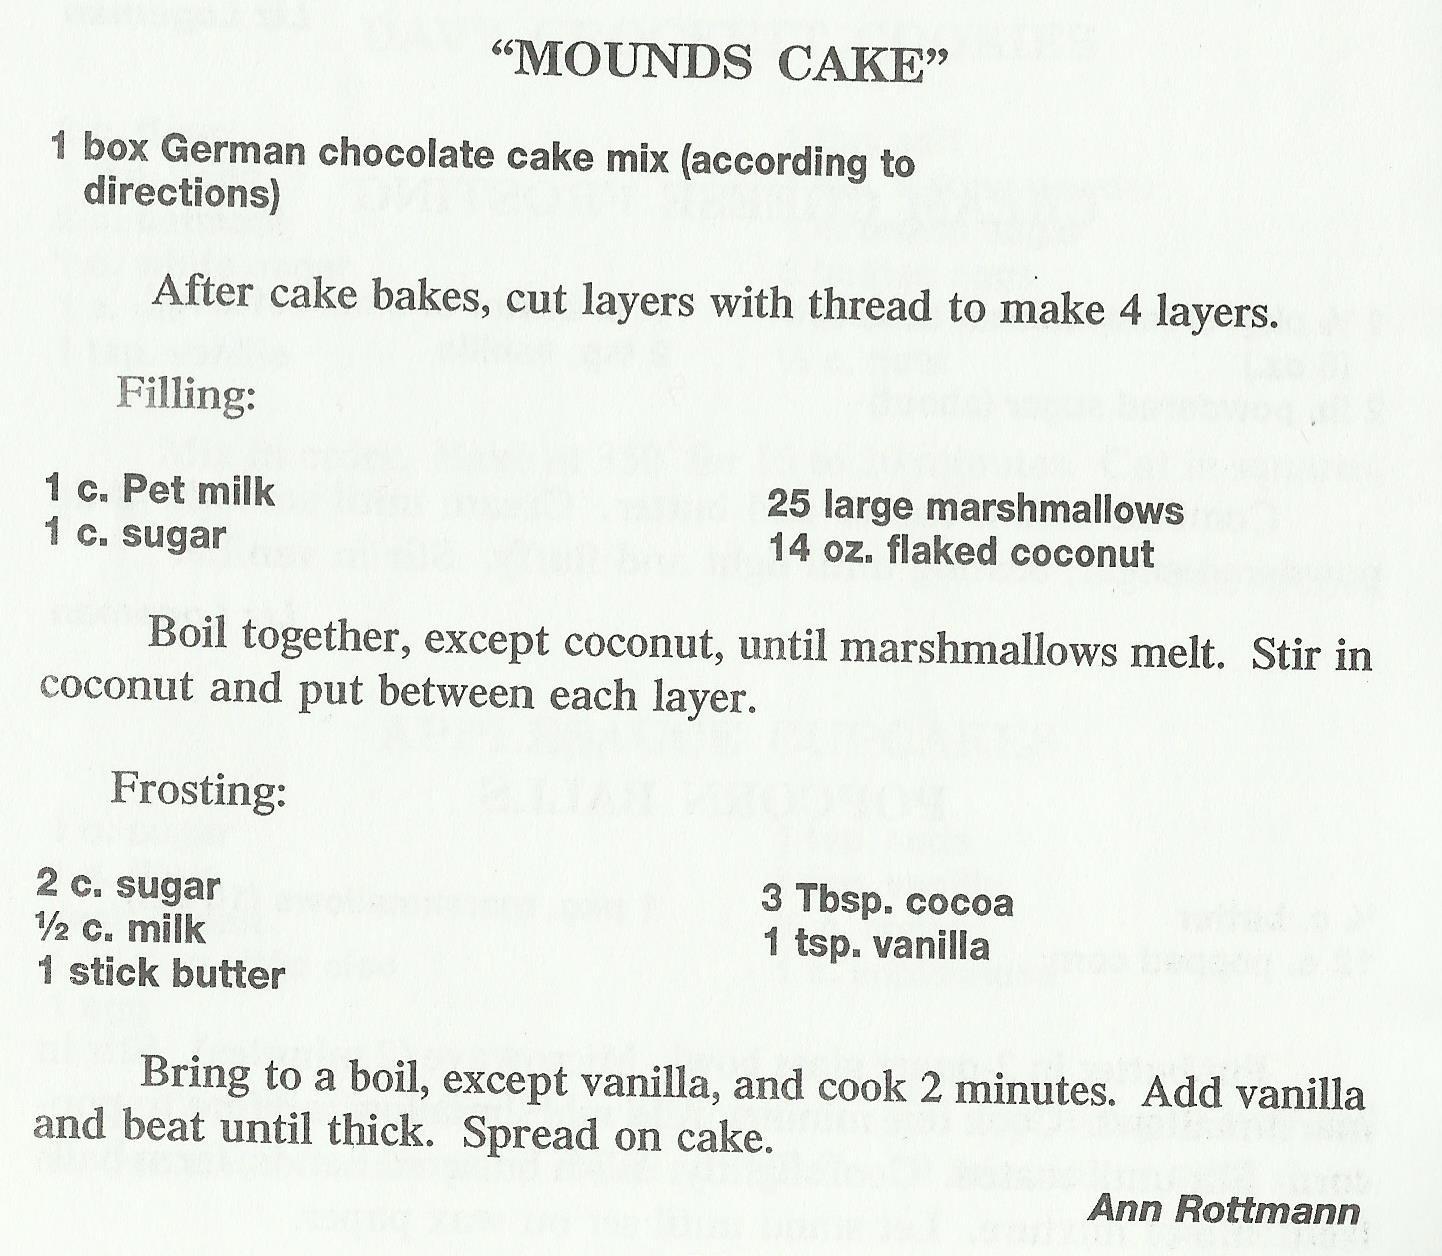 Mounds Cake